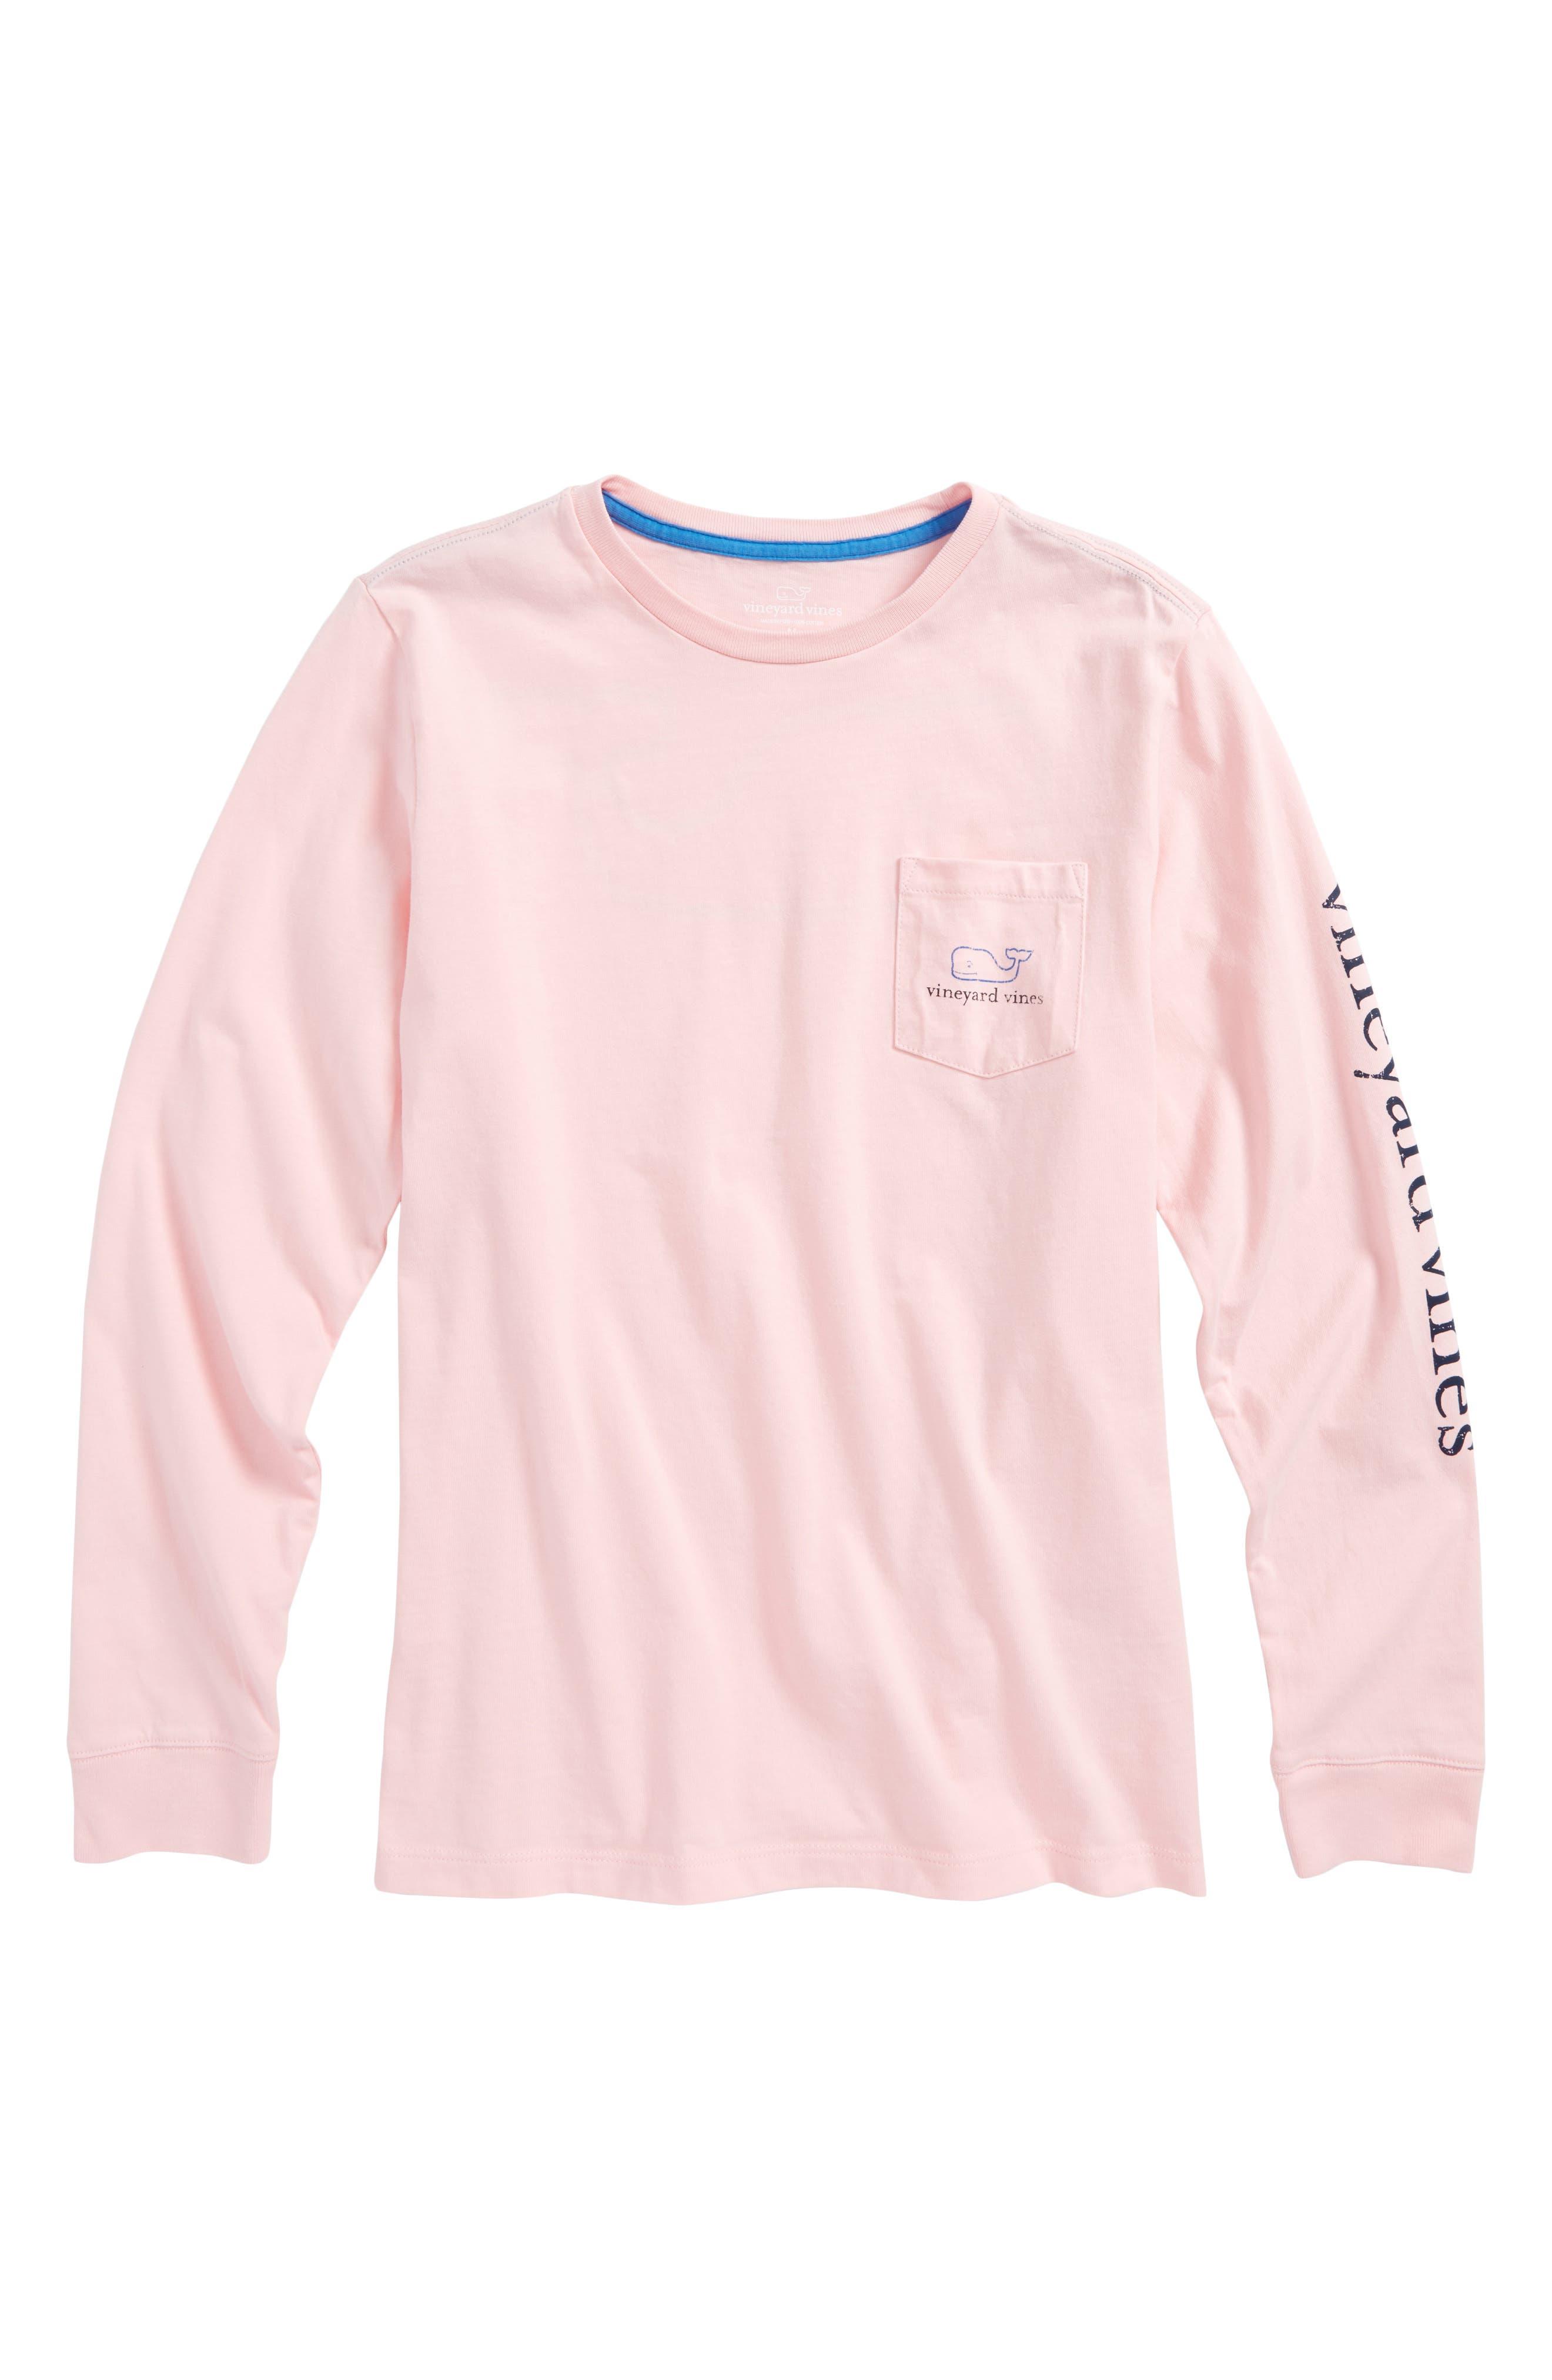 vineyard vines Vintage Whale Long Sleeve Pocket T-Shirt (Toddler Boys, Little Boys & Big Boys)